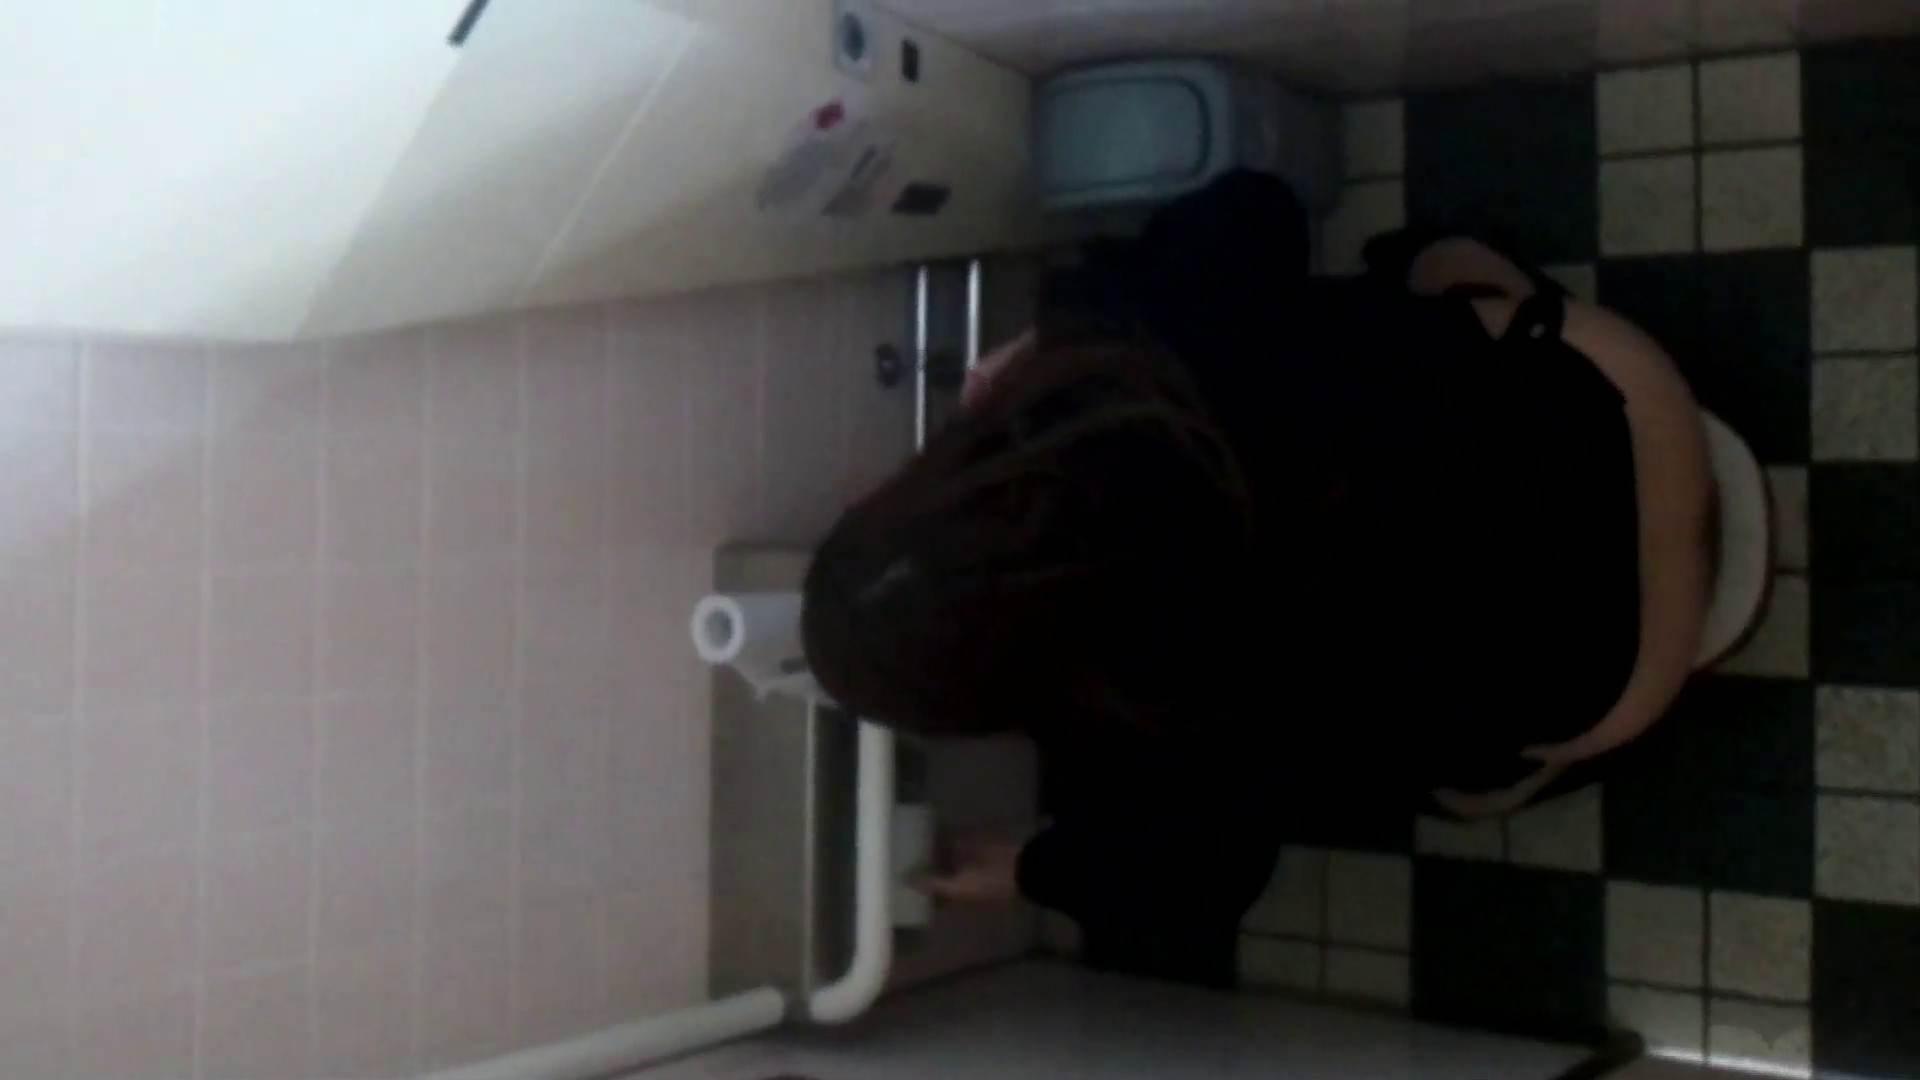 ▲復活限定▲化粧室絵巻 駅舎編 VOL.06 洗面所のぞき  103枚 4